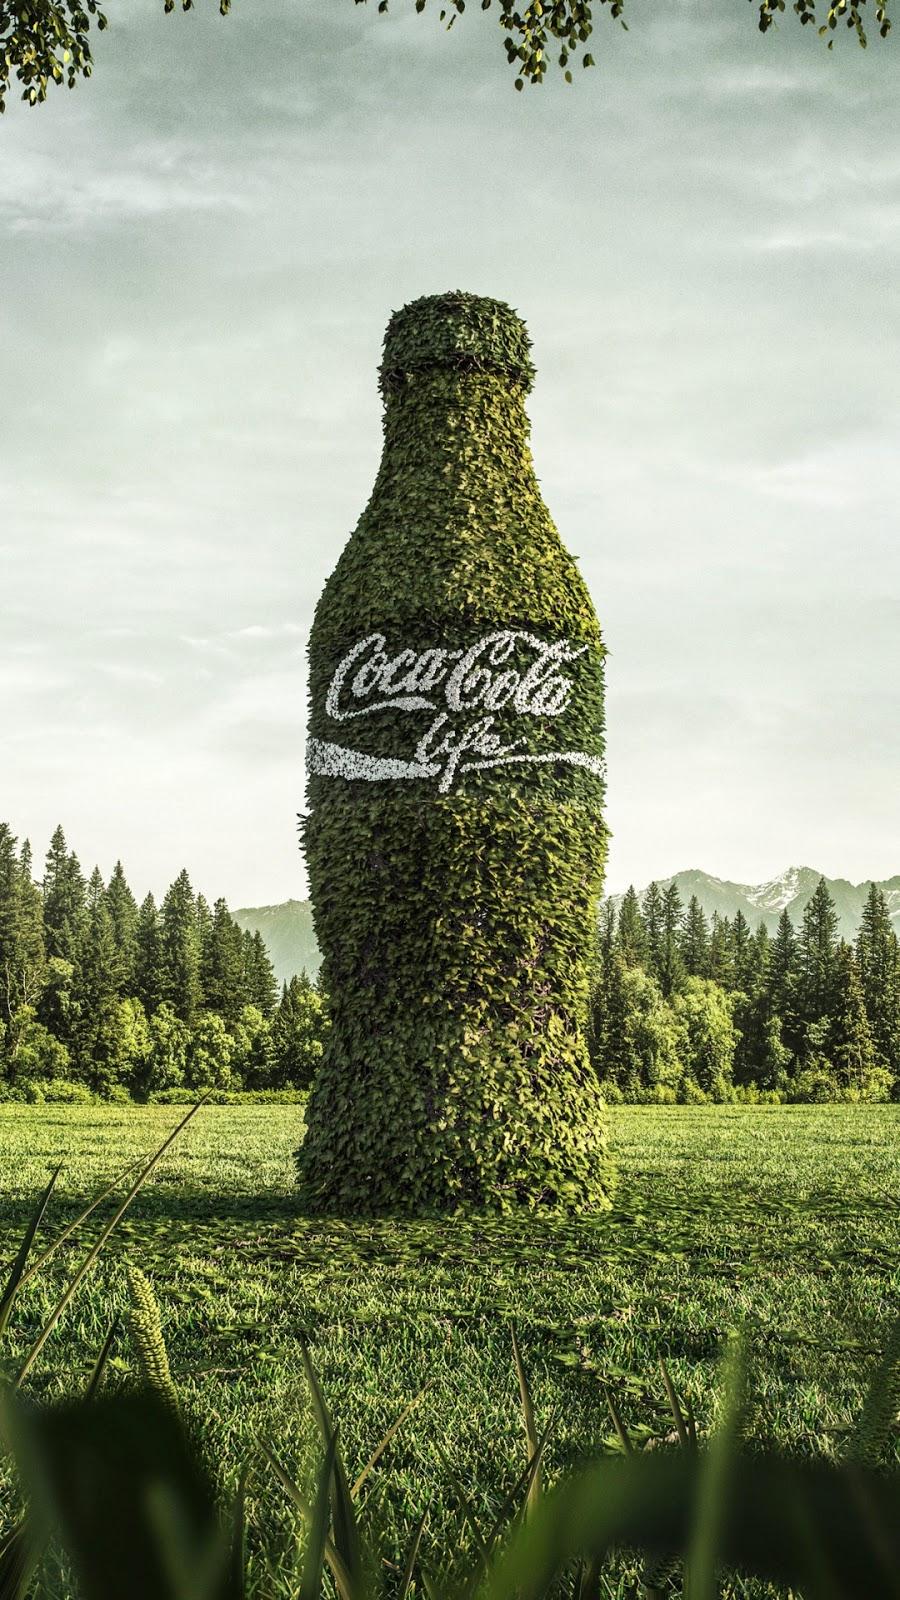 Papel de parede grátis Coca-Cola Life para PC, Notebook, iPhone, Android e Tablet.